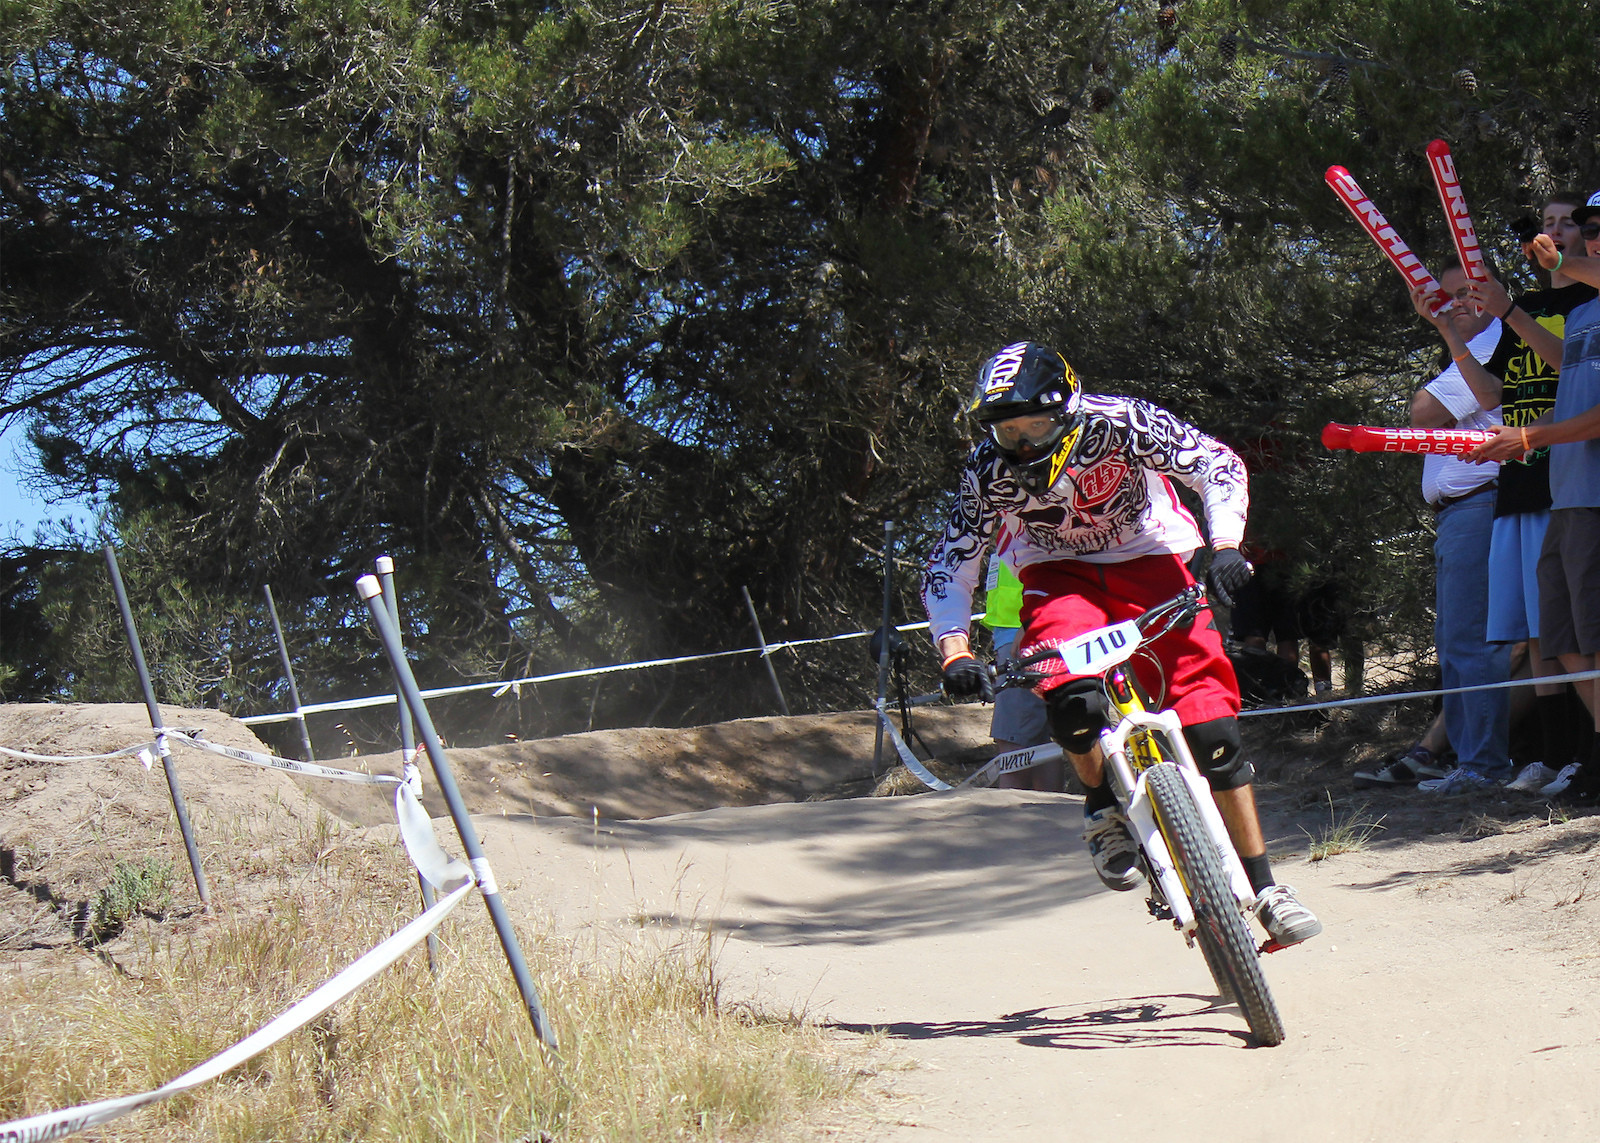 Racing at Sea Otter - Dirtyslim69 - Mountain Biking Pictures - Vital MTB